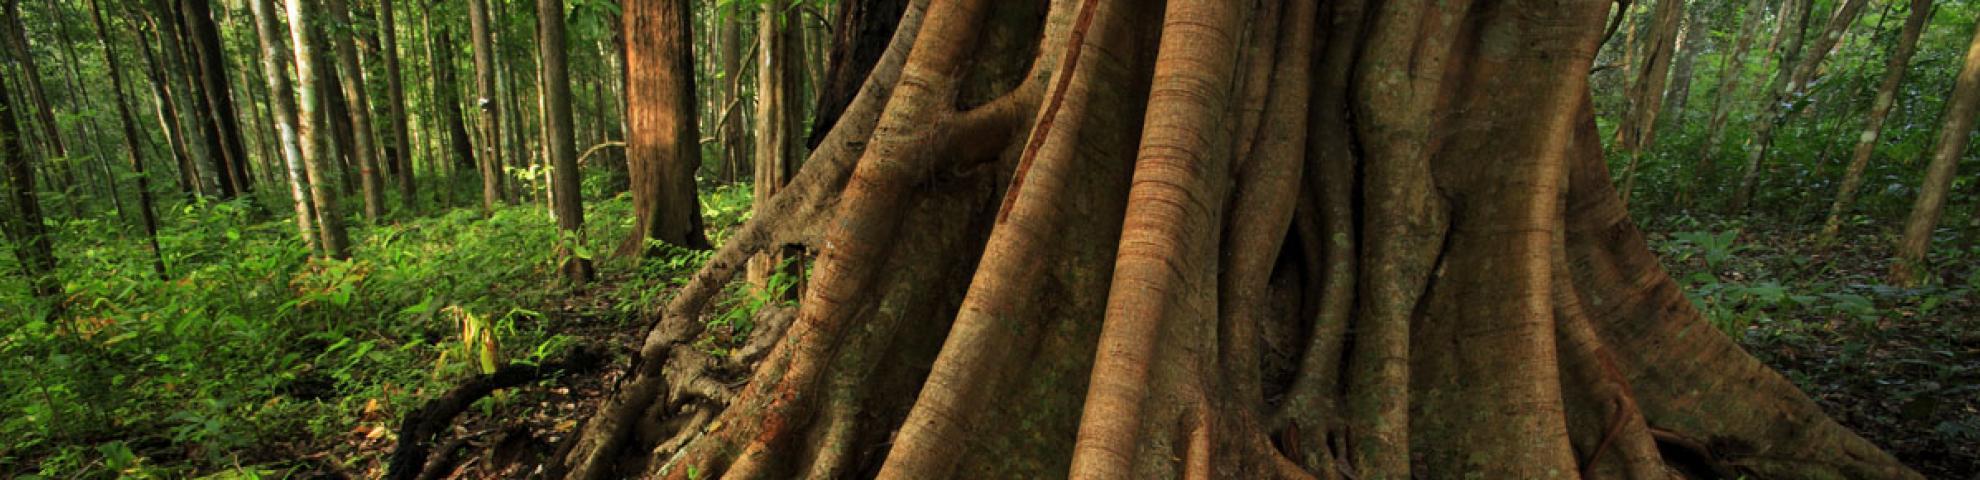 HKK dipterocarp tree